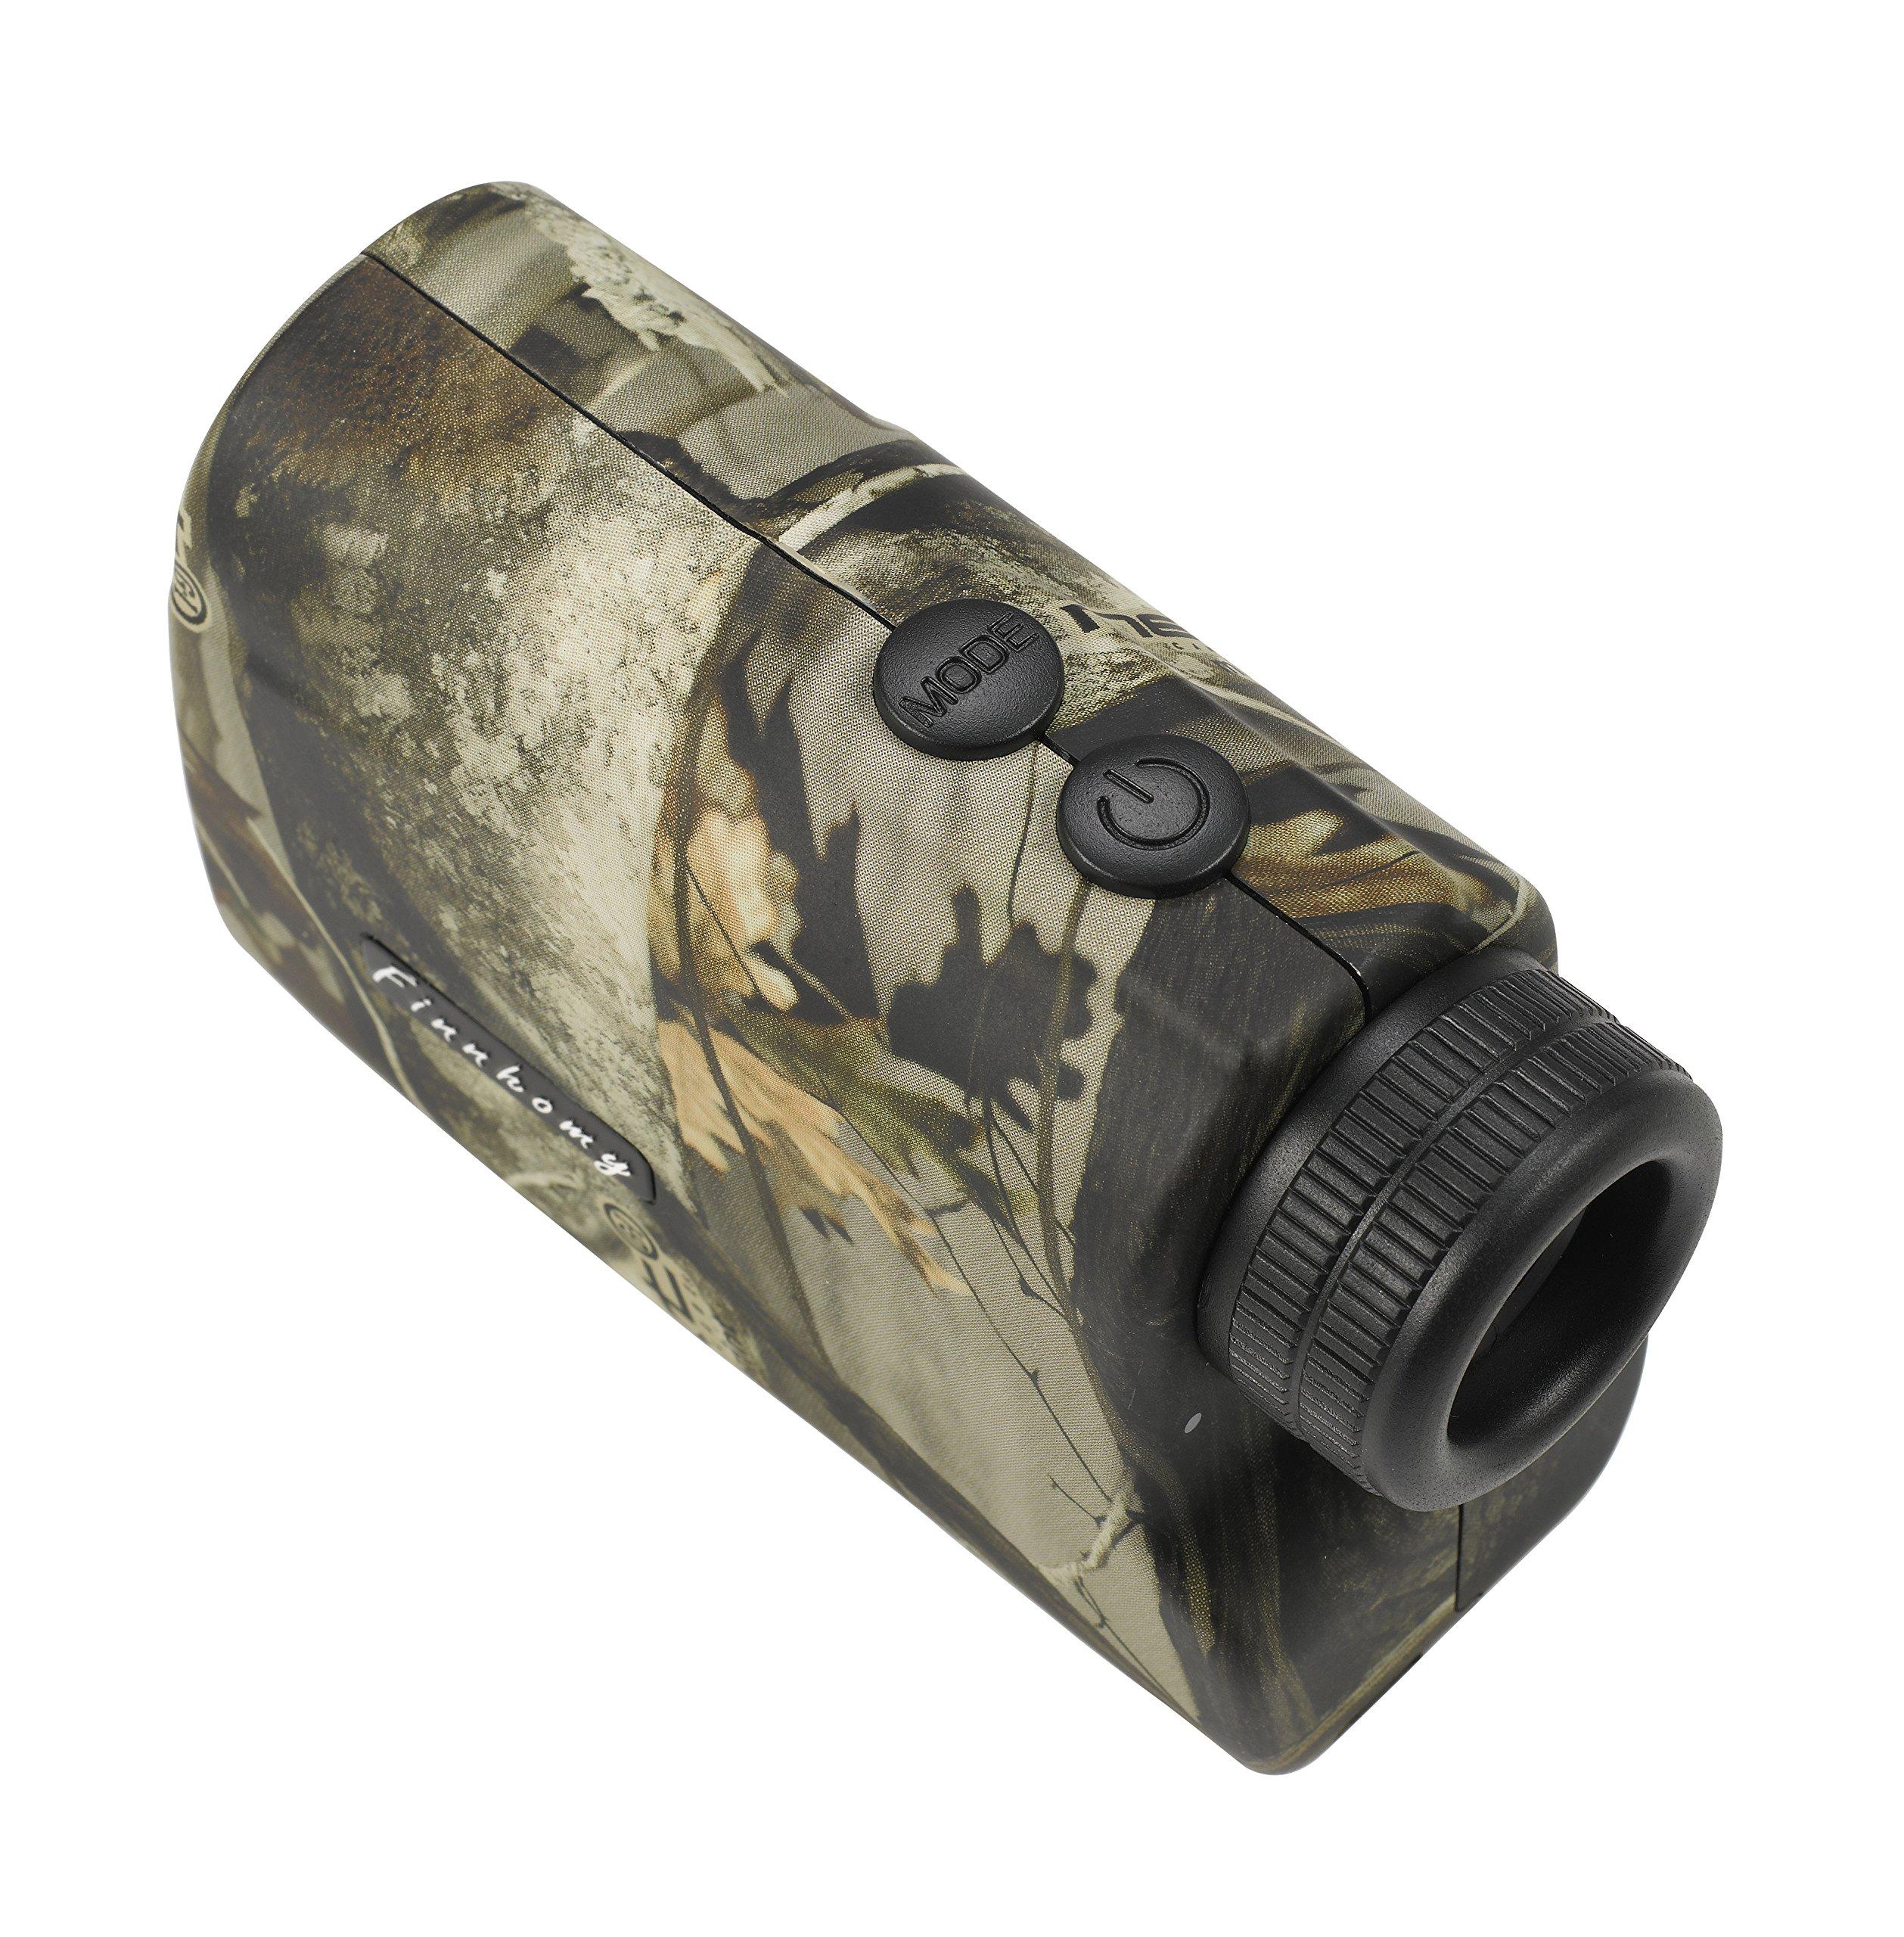 Finnhomy 6 x 25mm Laser Binocular Rangefinder Distance Range Finder Speed Distance Measurement Scope 600 Yards Outdoor Activity Hunting Golf Racing Climbing Navigation Forestry Waterproof Free Battery by Finnhomy (Image #3)